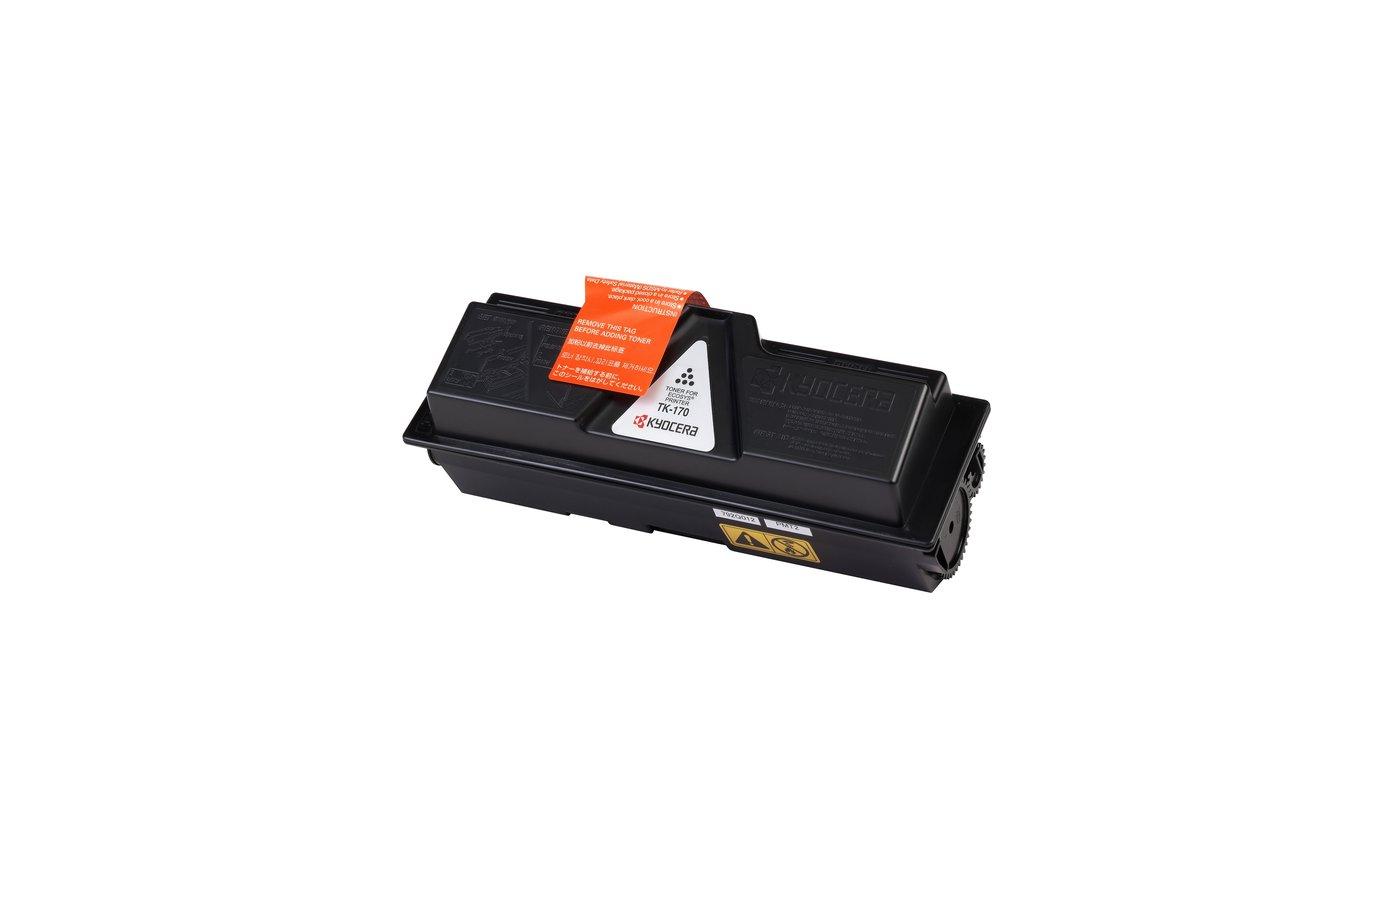 Картридж лазерный NV-Print совместимый Kyocera TK-170 для FS-1320/1320N/1320DN/1370/1370N/1370DN. Чёрный. 7200 страниц